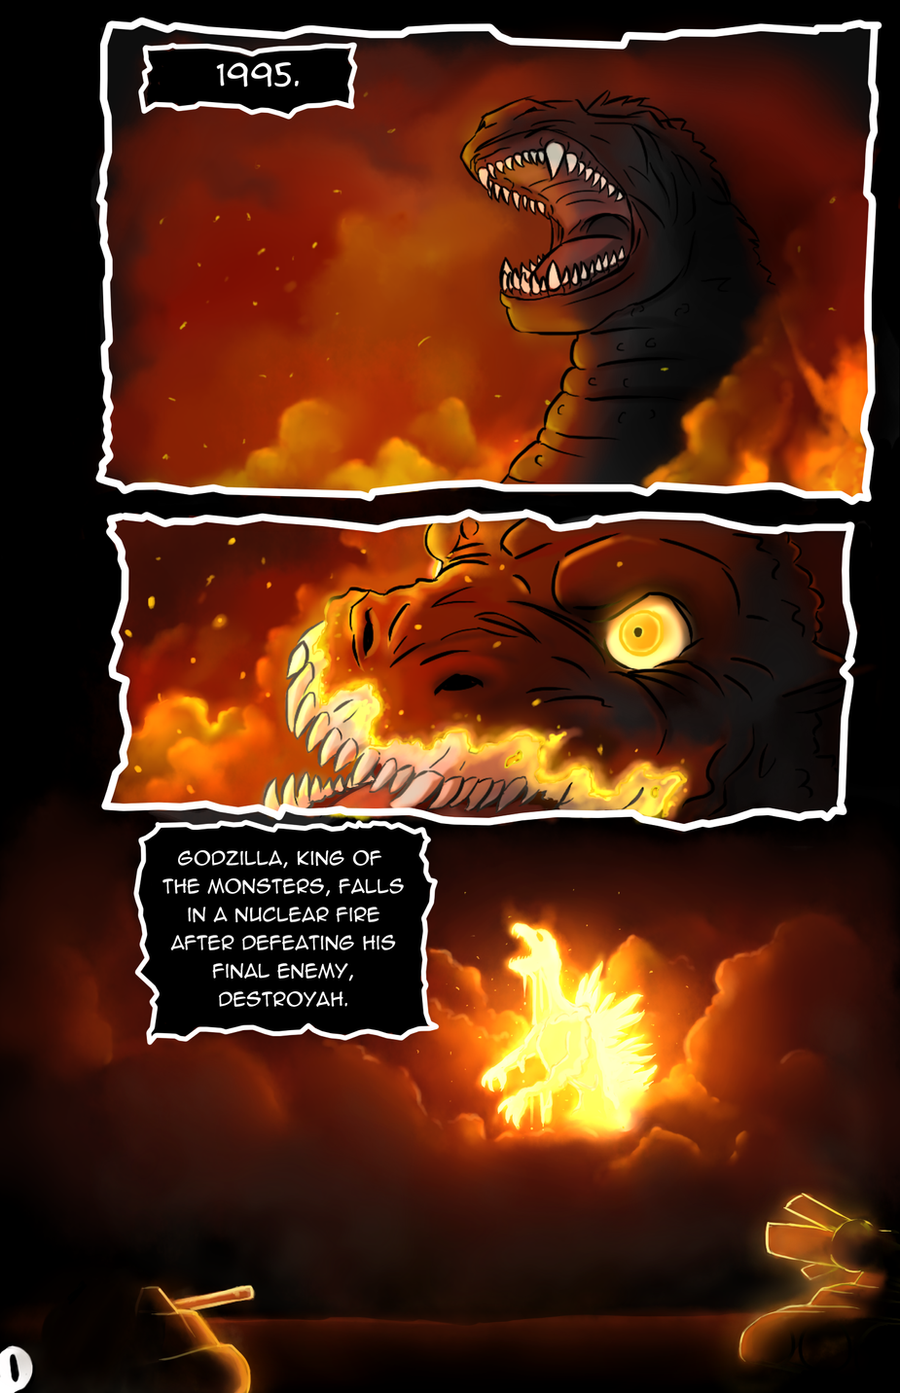 Godzilla Triumphant (2.0) - Page 1 by kaijukid